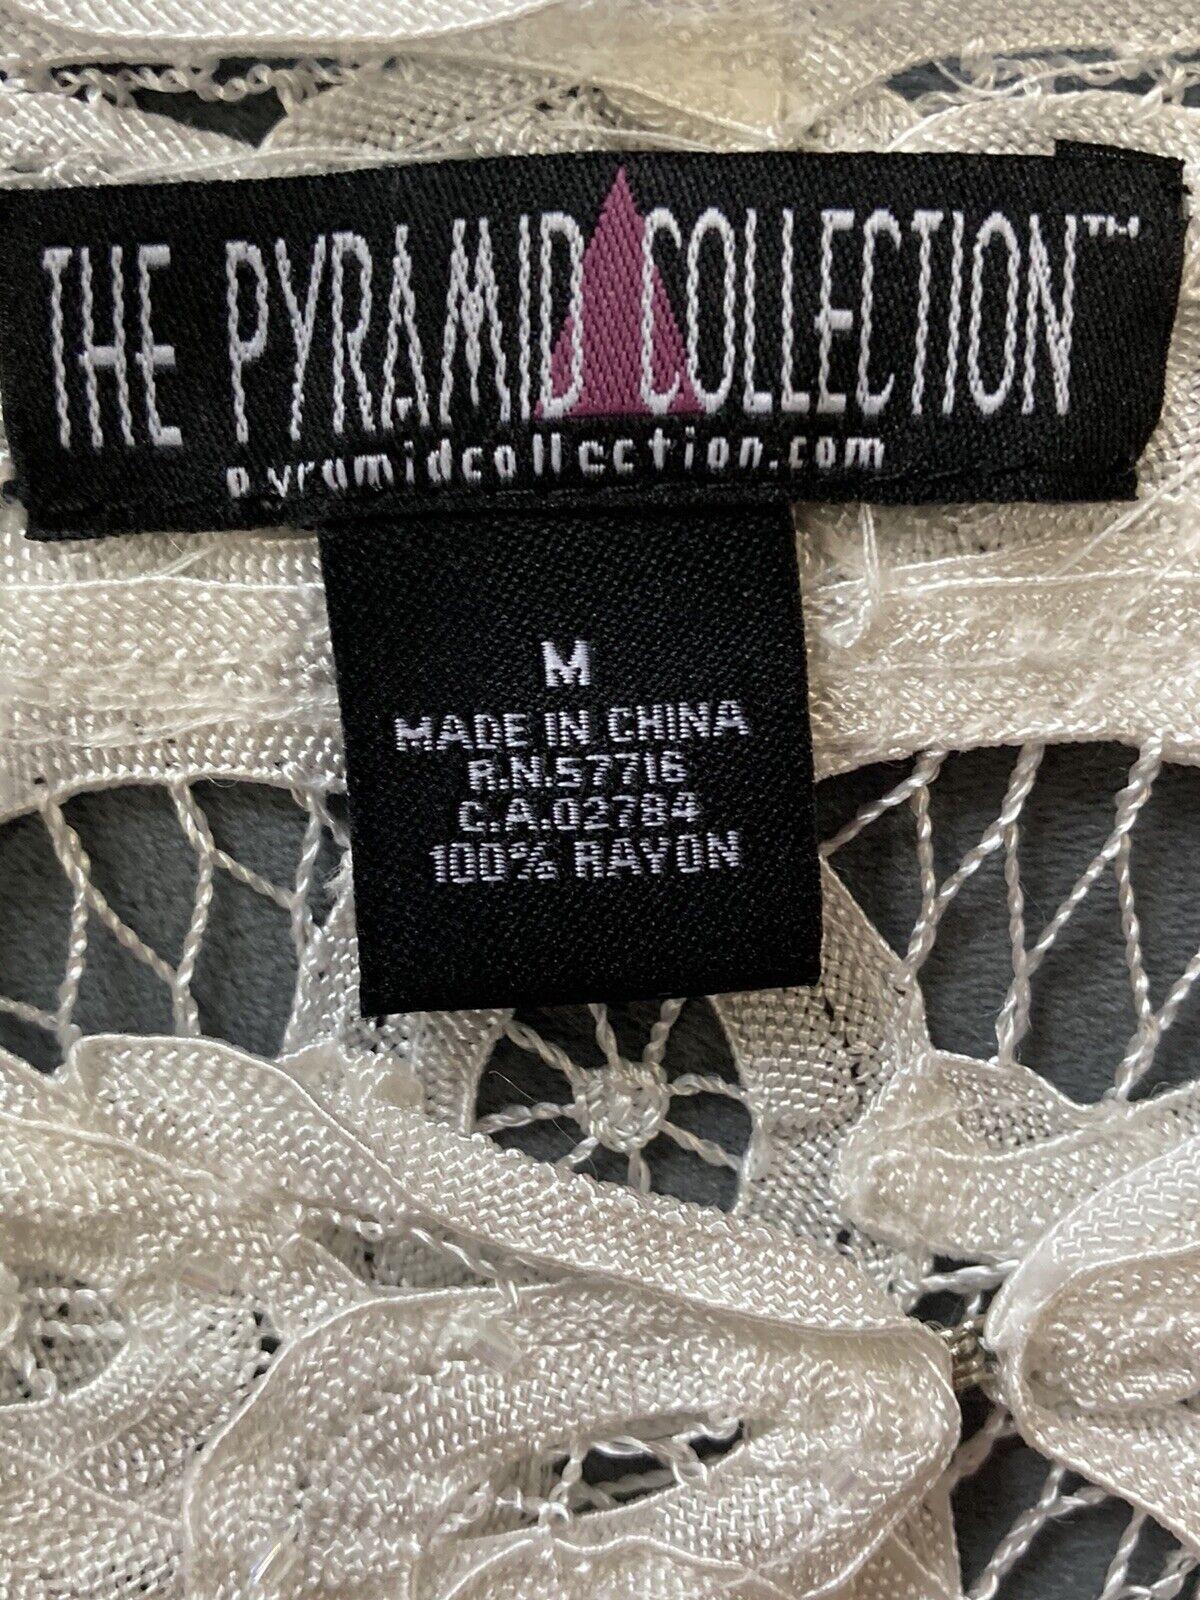 90s vintage fairycore bohemian crochet sweater - image 3